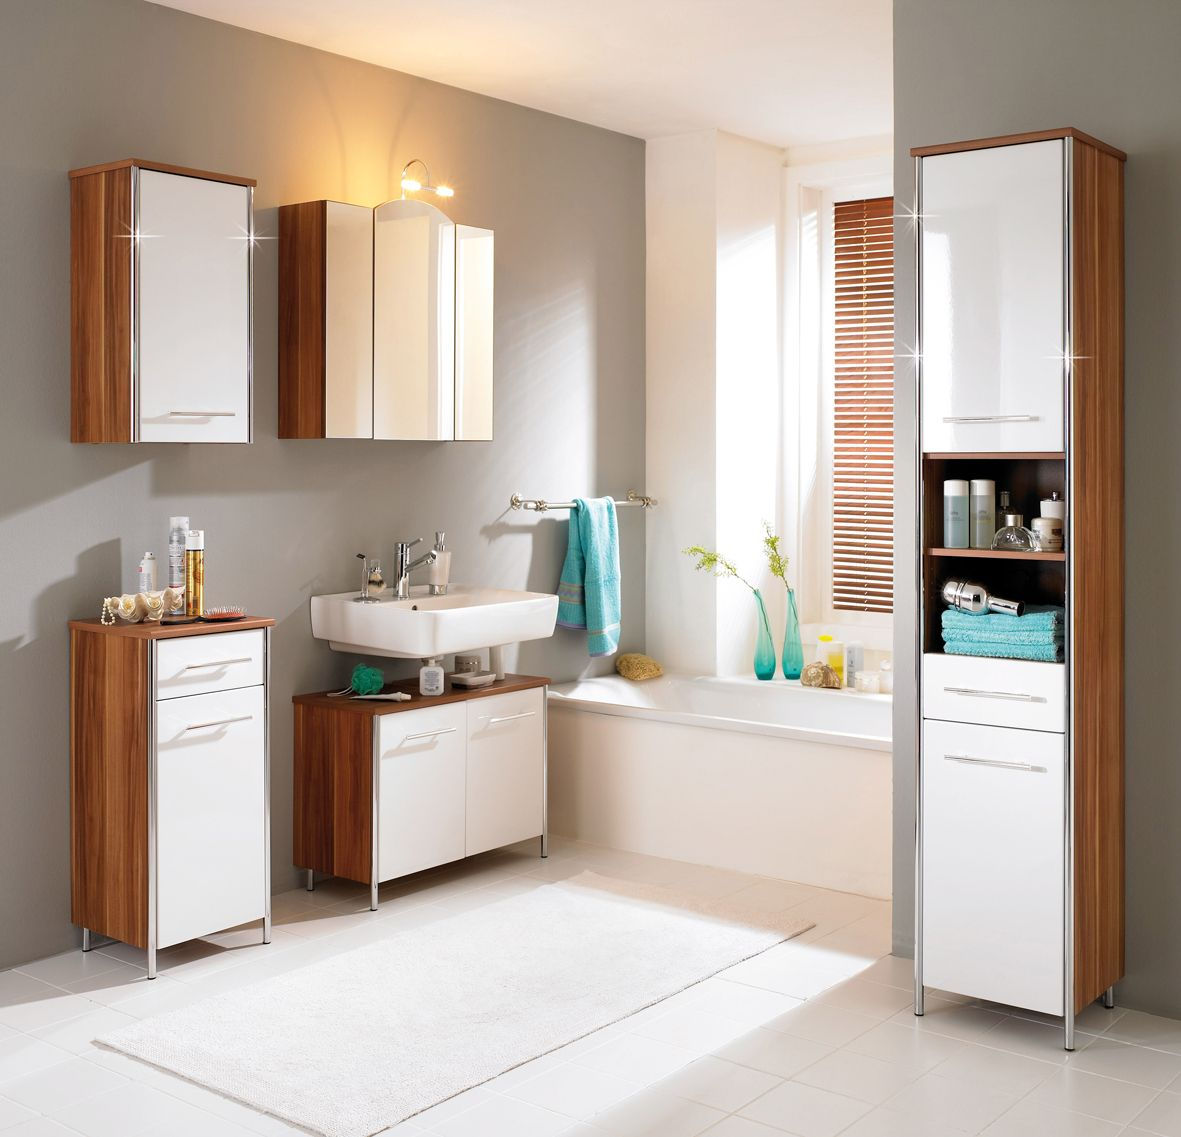 Bathrooms By Design Bathrooms Are Us Brisbane Bathroom Renovation And Design Billington Design Bathrooms Kendal